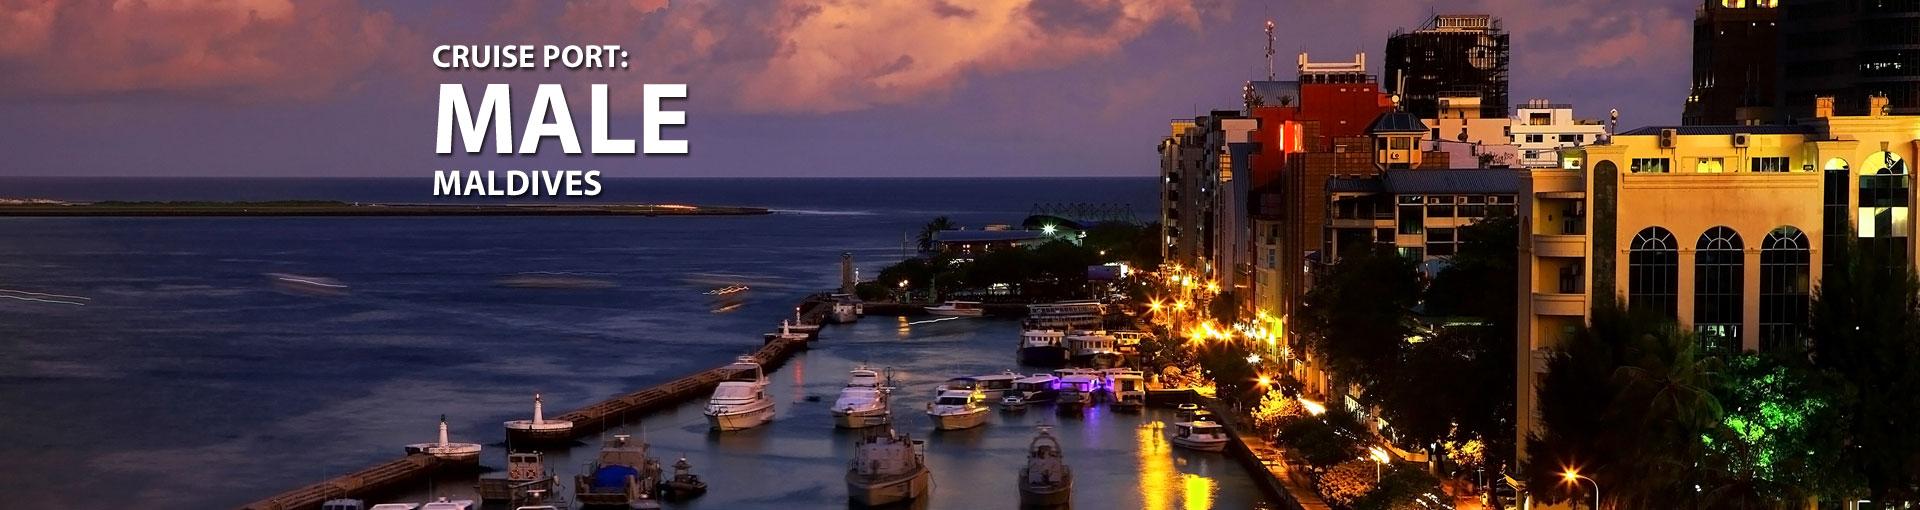 Cruises to Male, Maldives